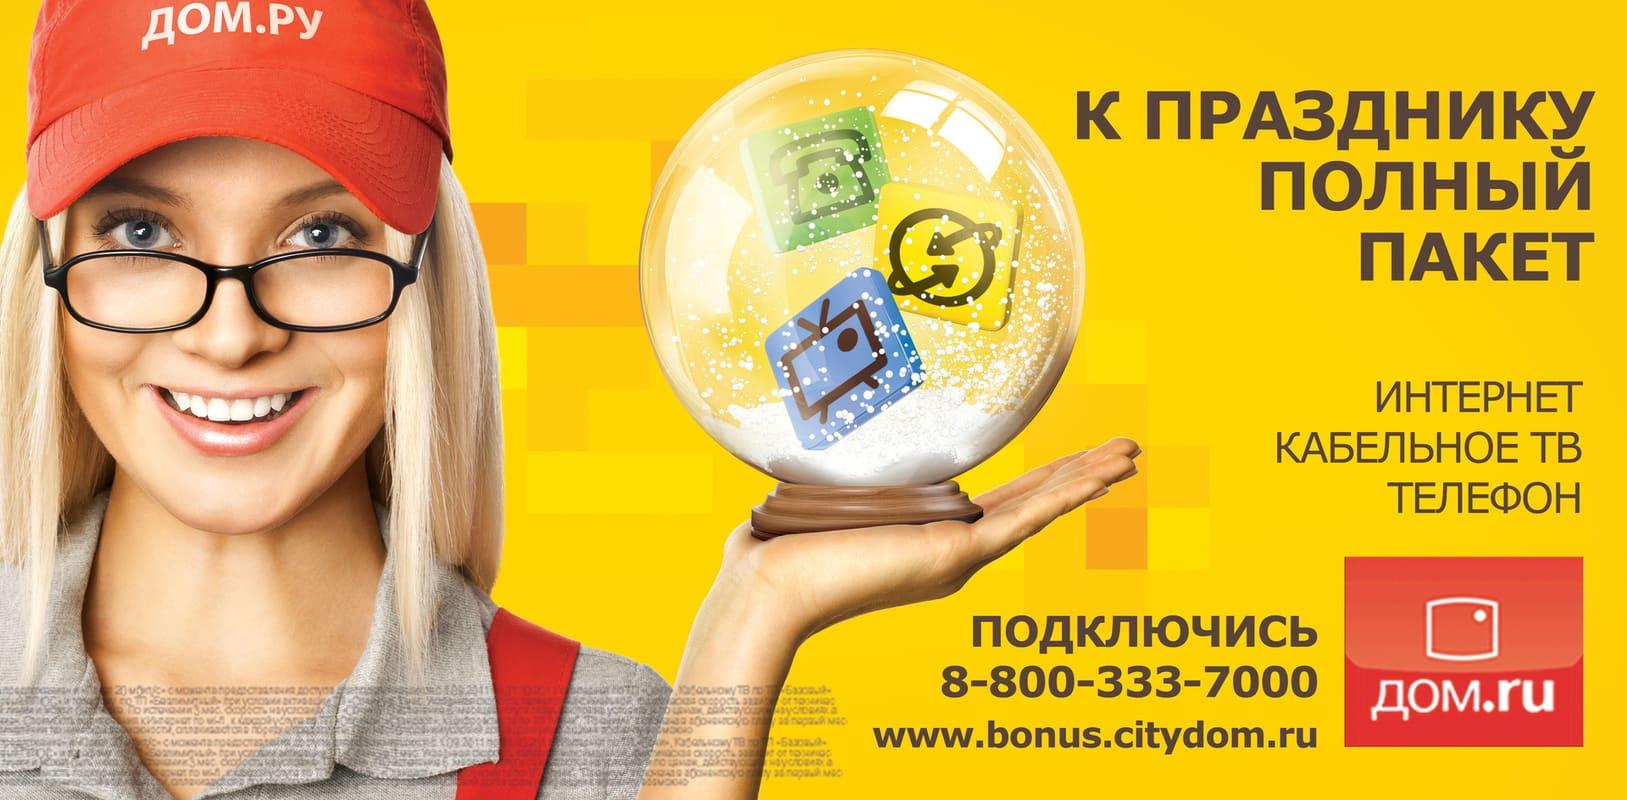 3D-модель, шар. Дом.ru